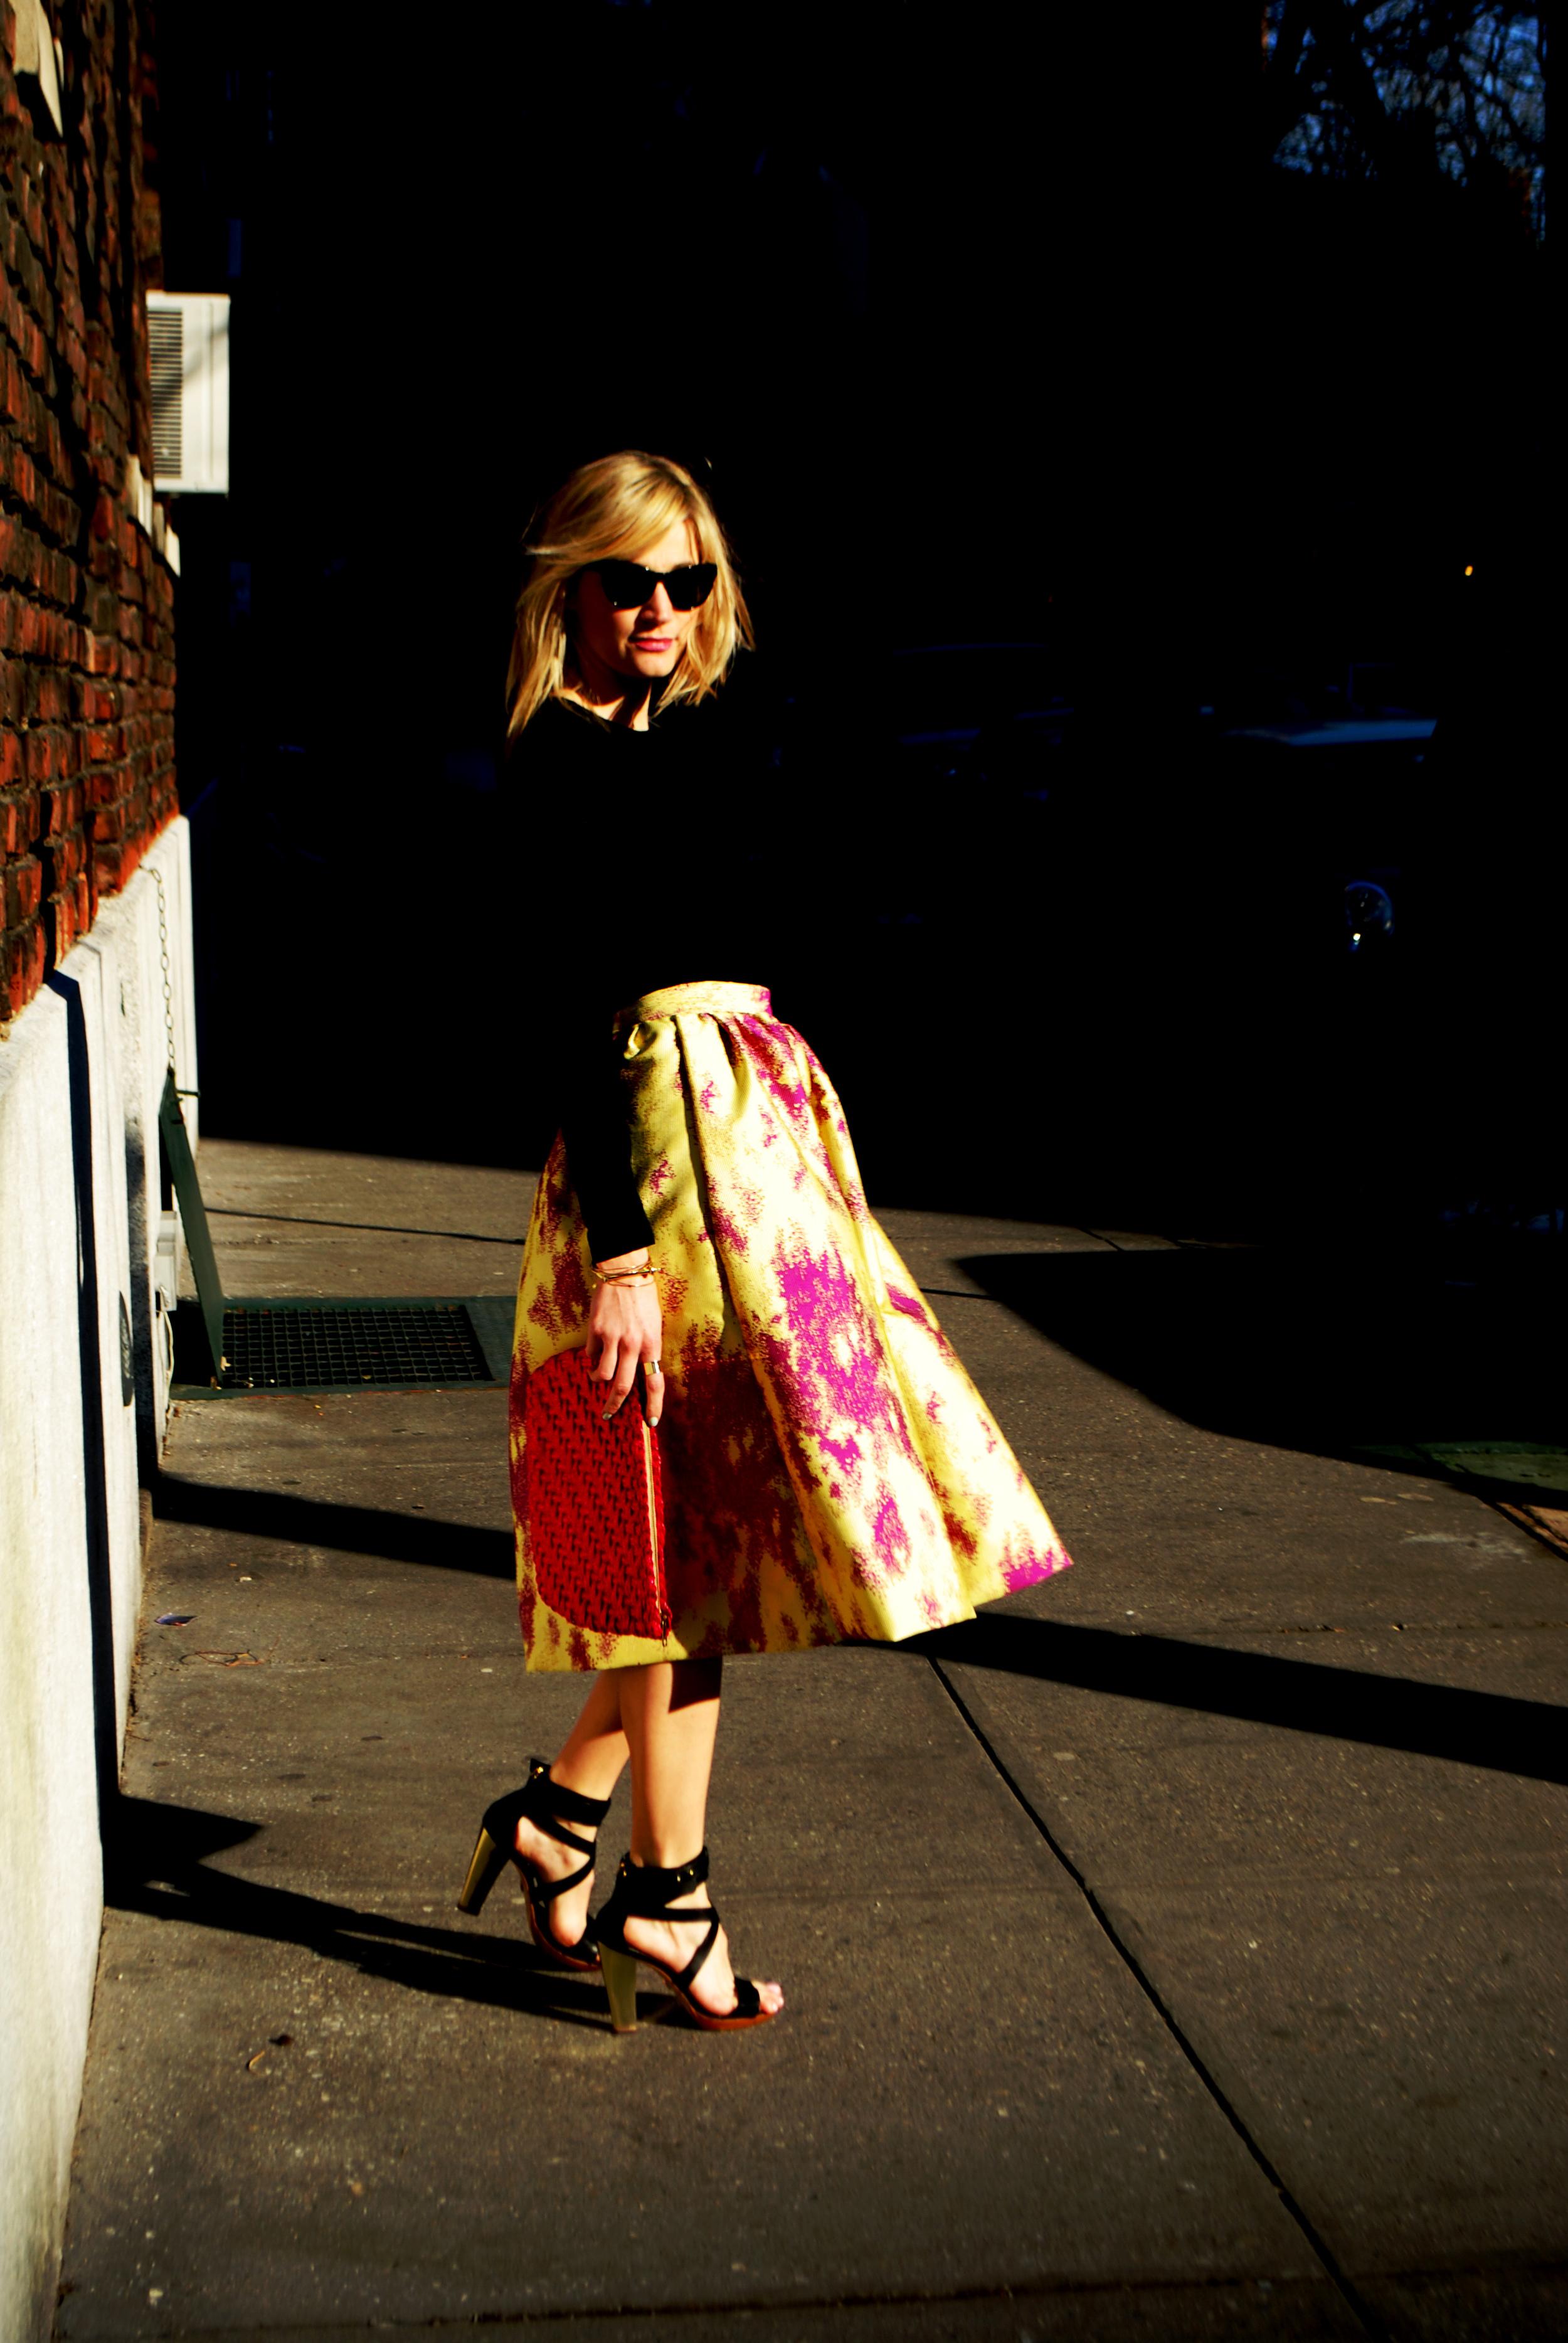 Top,  Gap ; Skirt, made by me; Shoes, Pour La Victoire ( similar here ); Bag, Vintage; Glasses,  RAEN